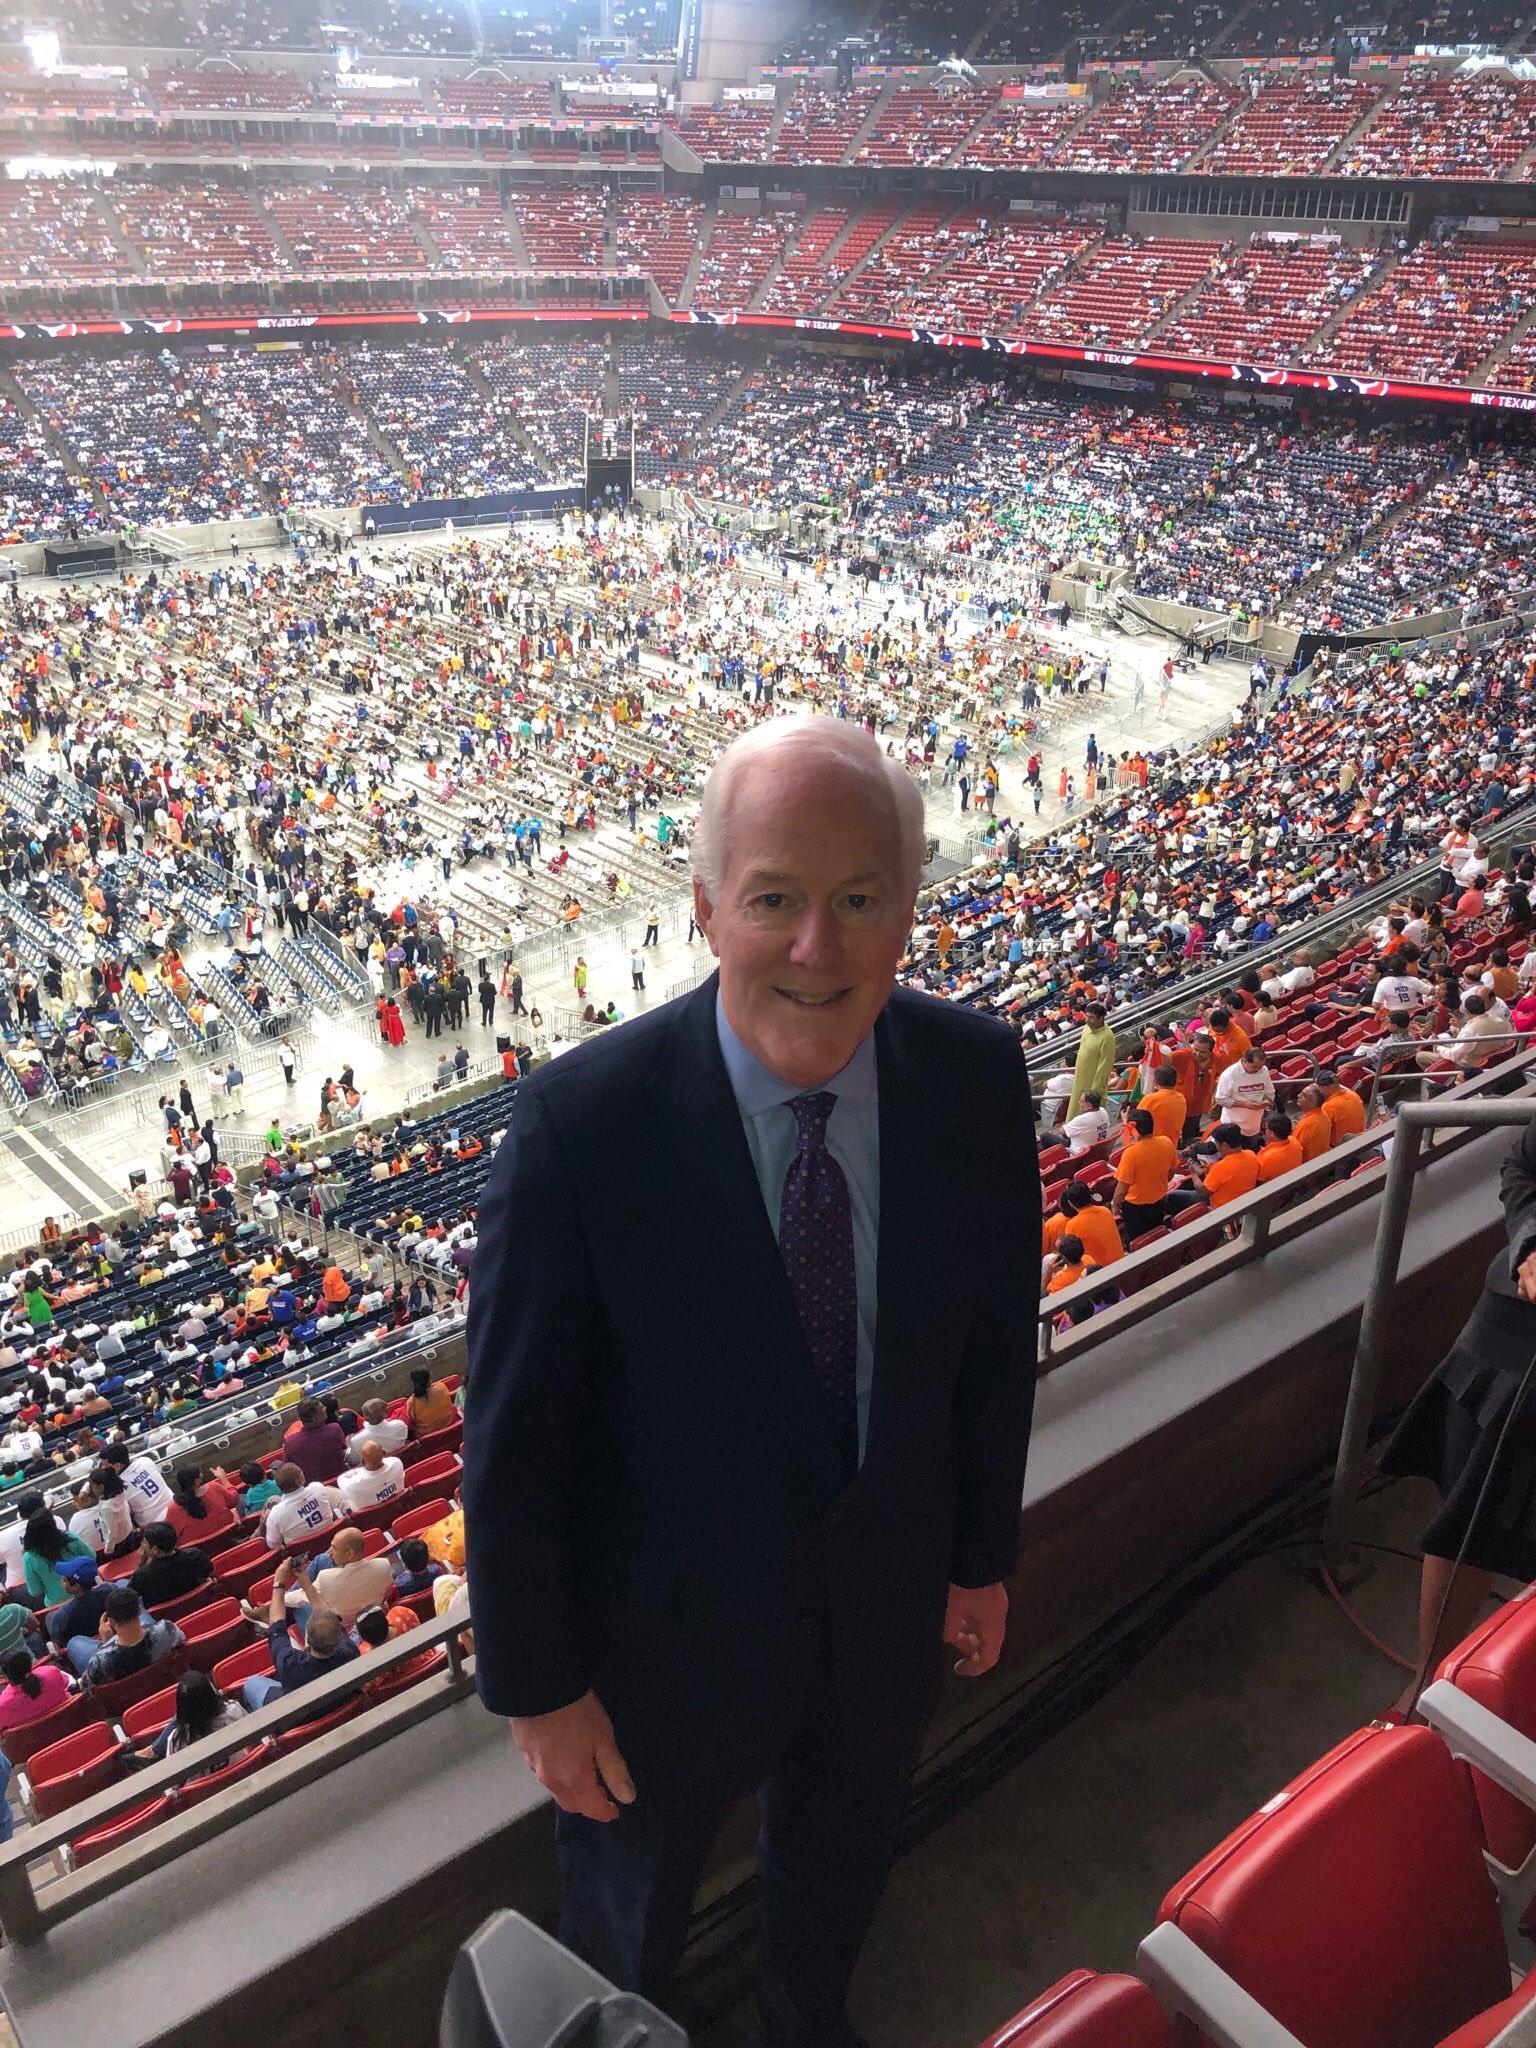 US Senator John Cornyn also addressed the crowd. Photo courtesy: Twitter